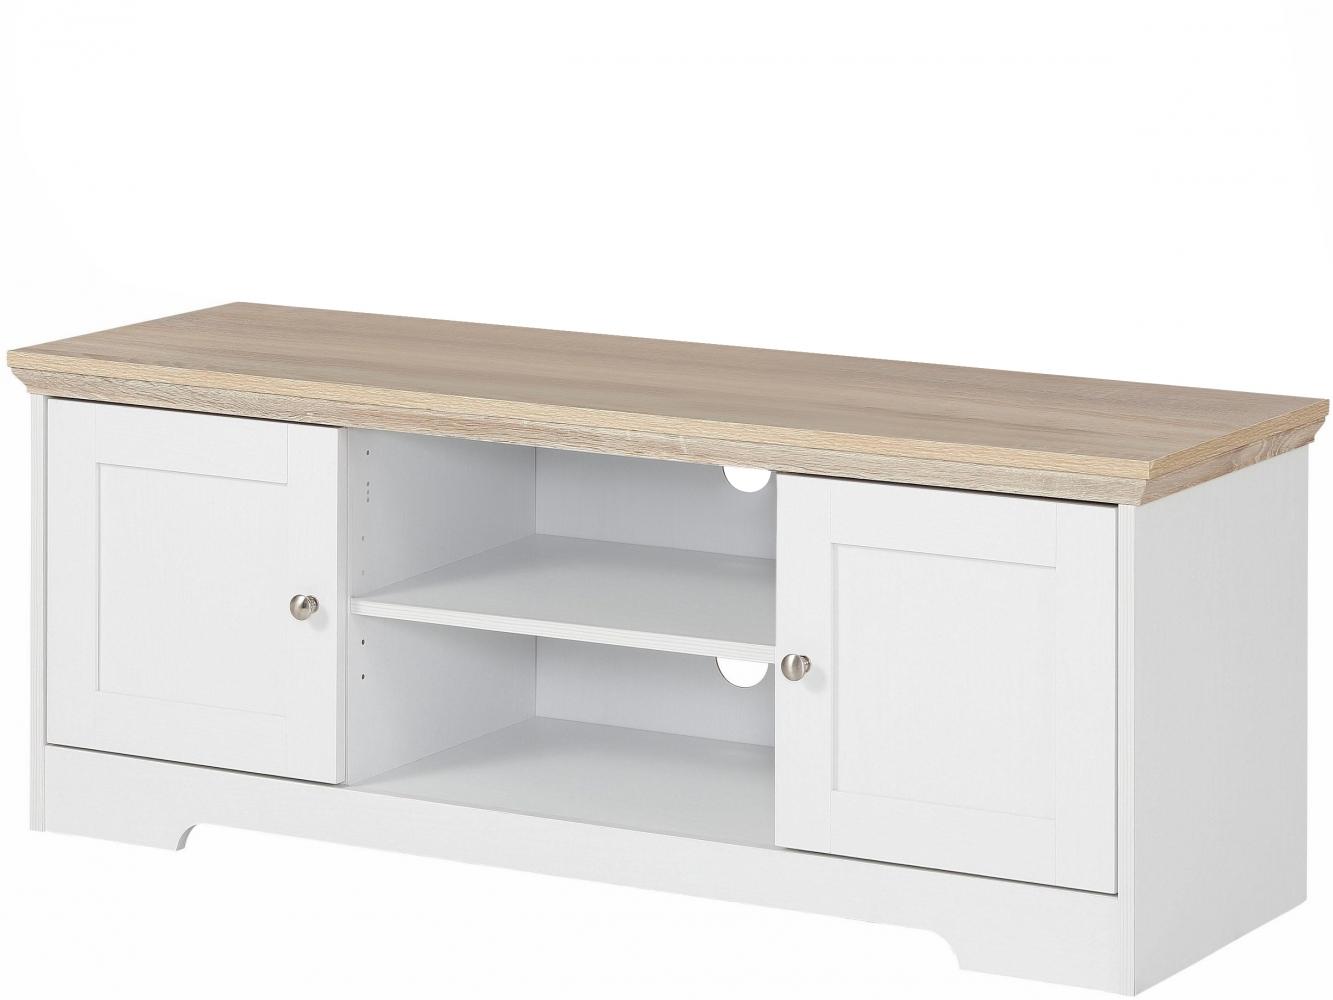 Tv stolek Nana, 120 cm, bílá